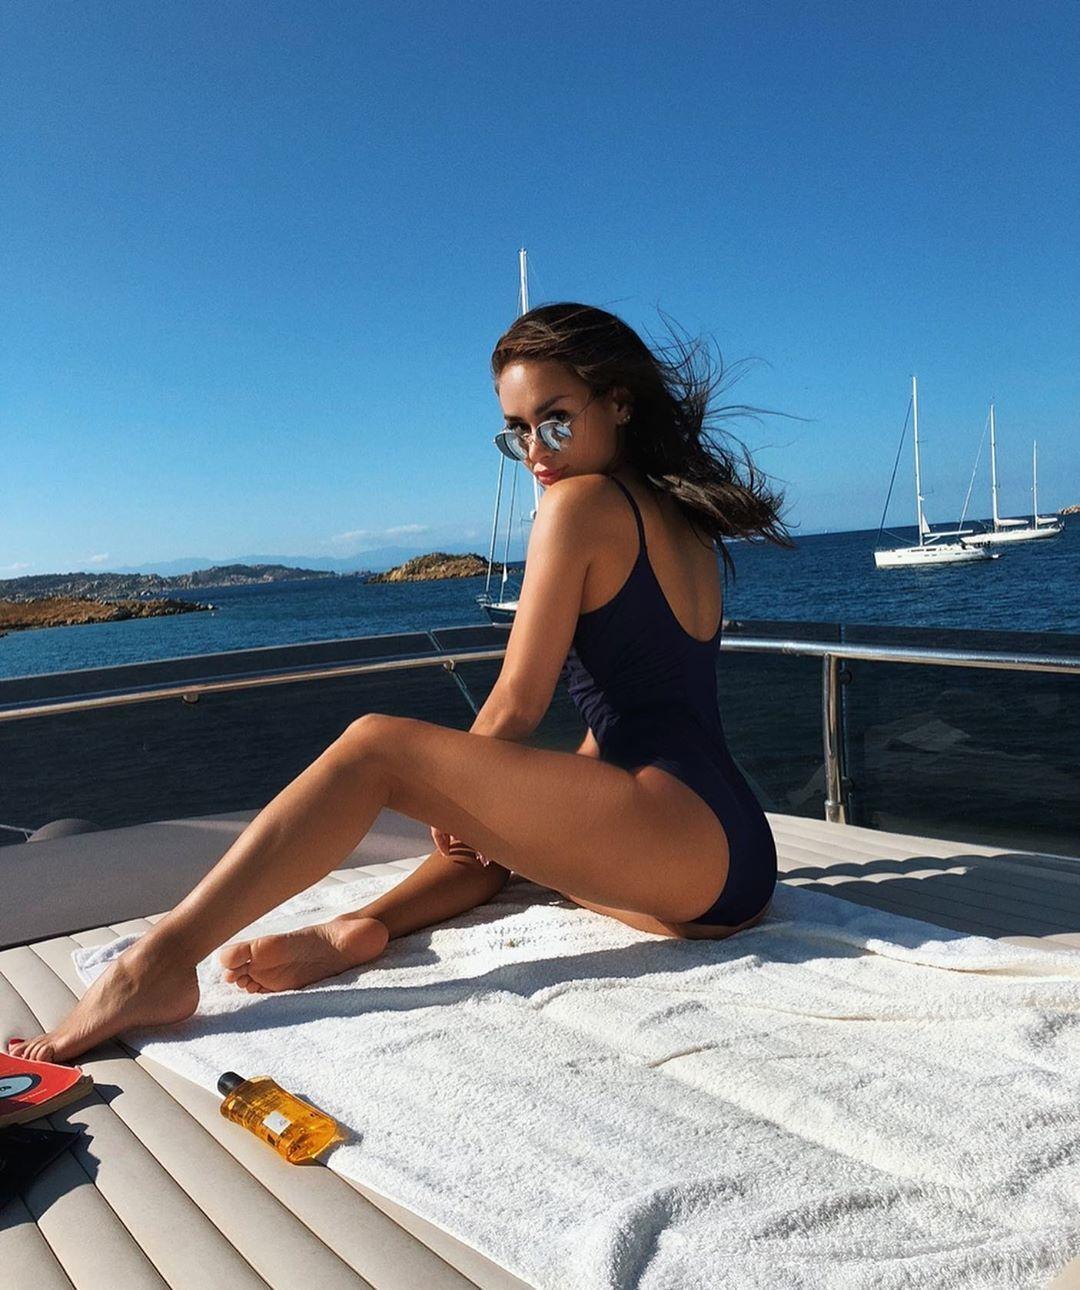 Аида Уразбахтина